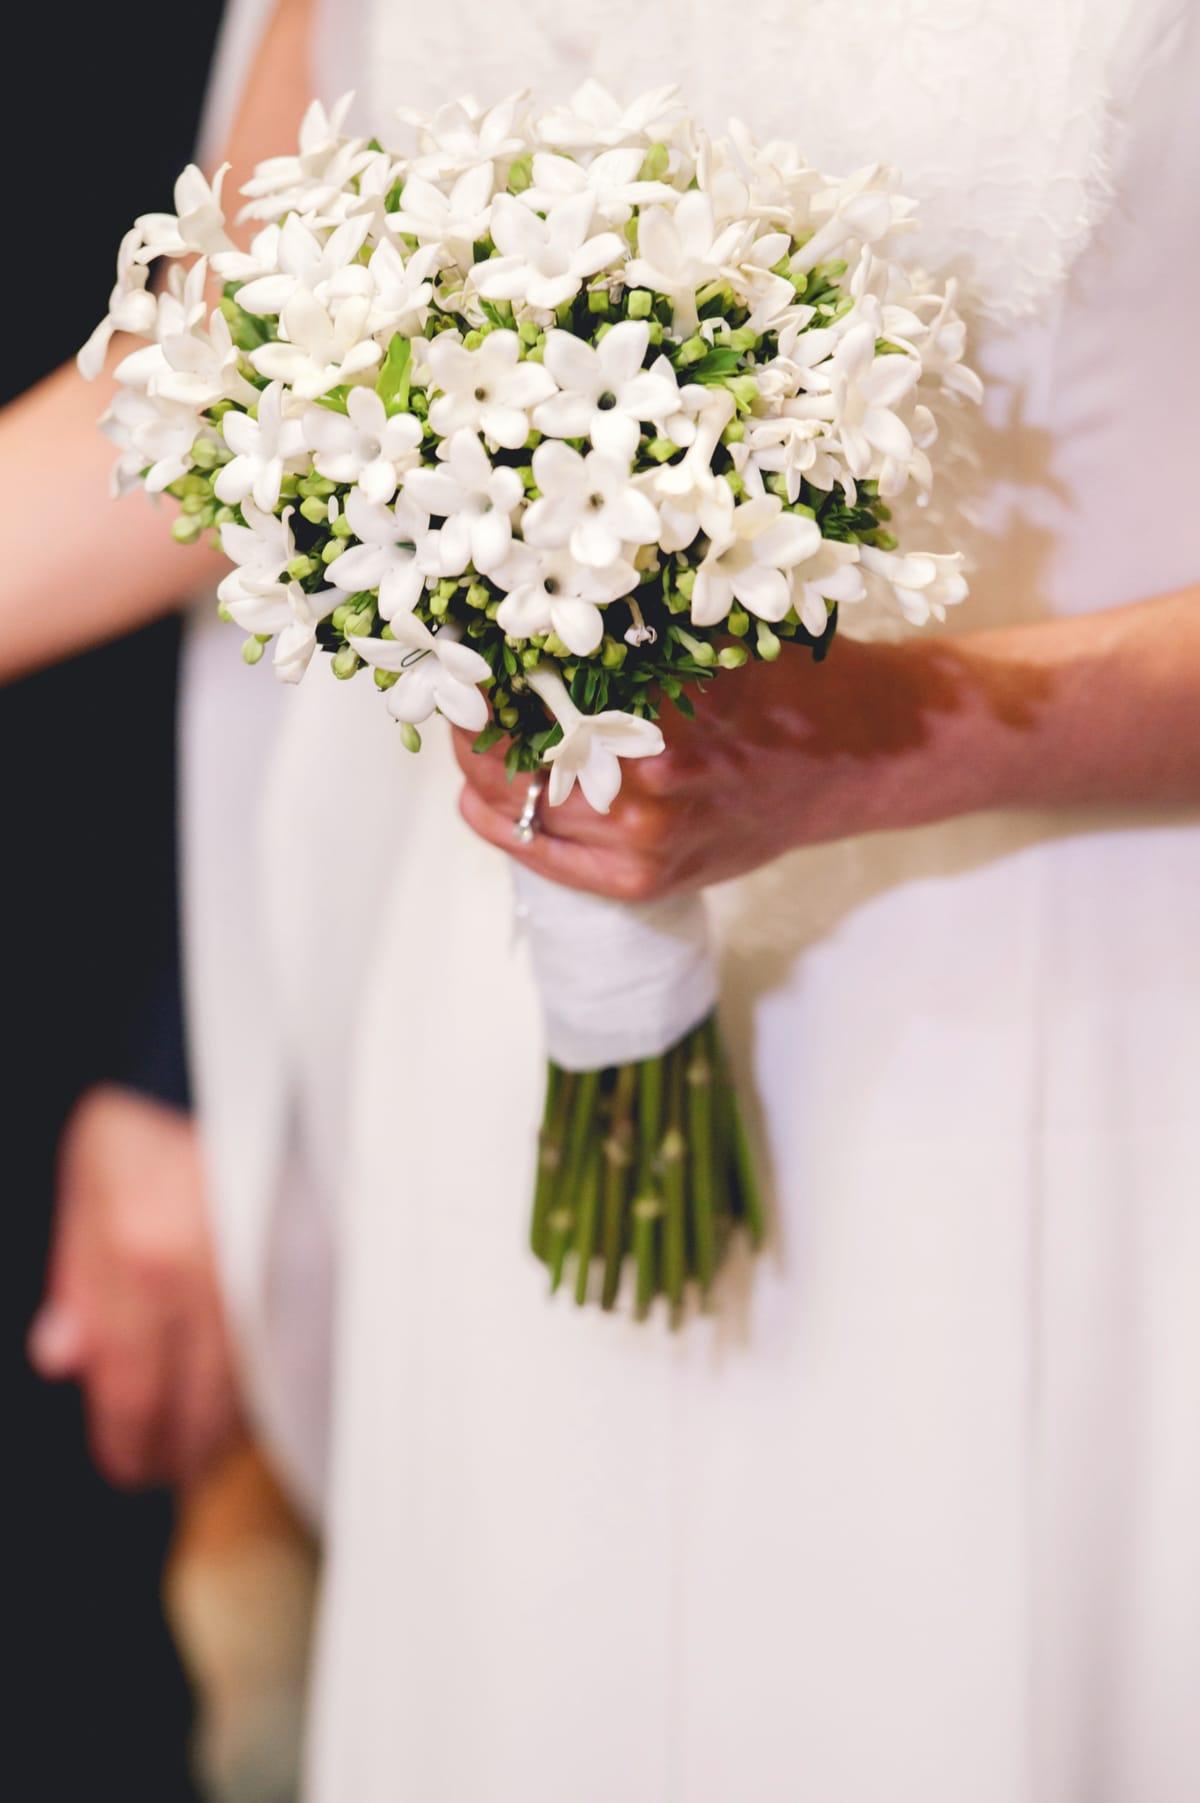 81b0944c8c30 νυφική ανθοδέσμη με λευκά λουλούδια